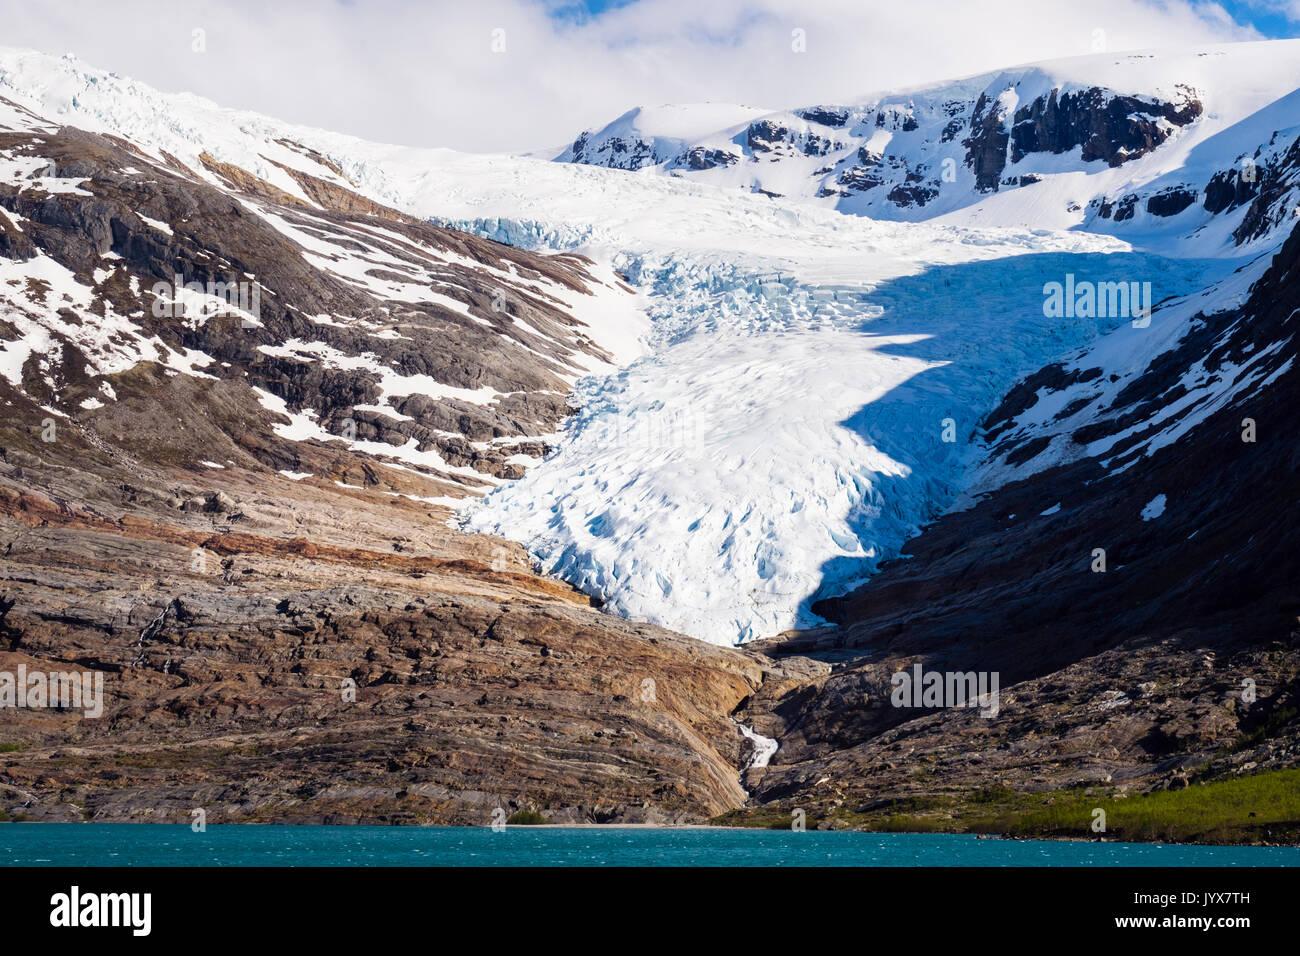 Engabreen ou glacier Svartisen Enga, bras de la calotte glaciaire de l'ensemble vu Engabrevatnet Svartisvatnet ou lac. Saltfjellet-Svartisen National Park, la Norvège Photo Stock